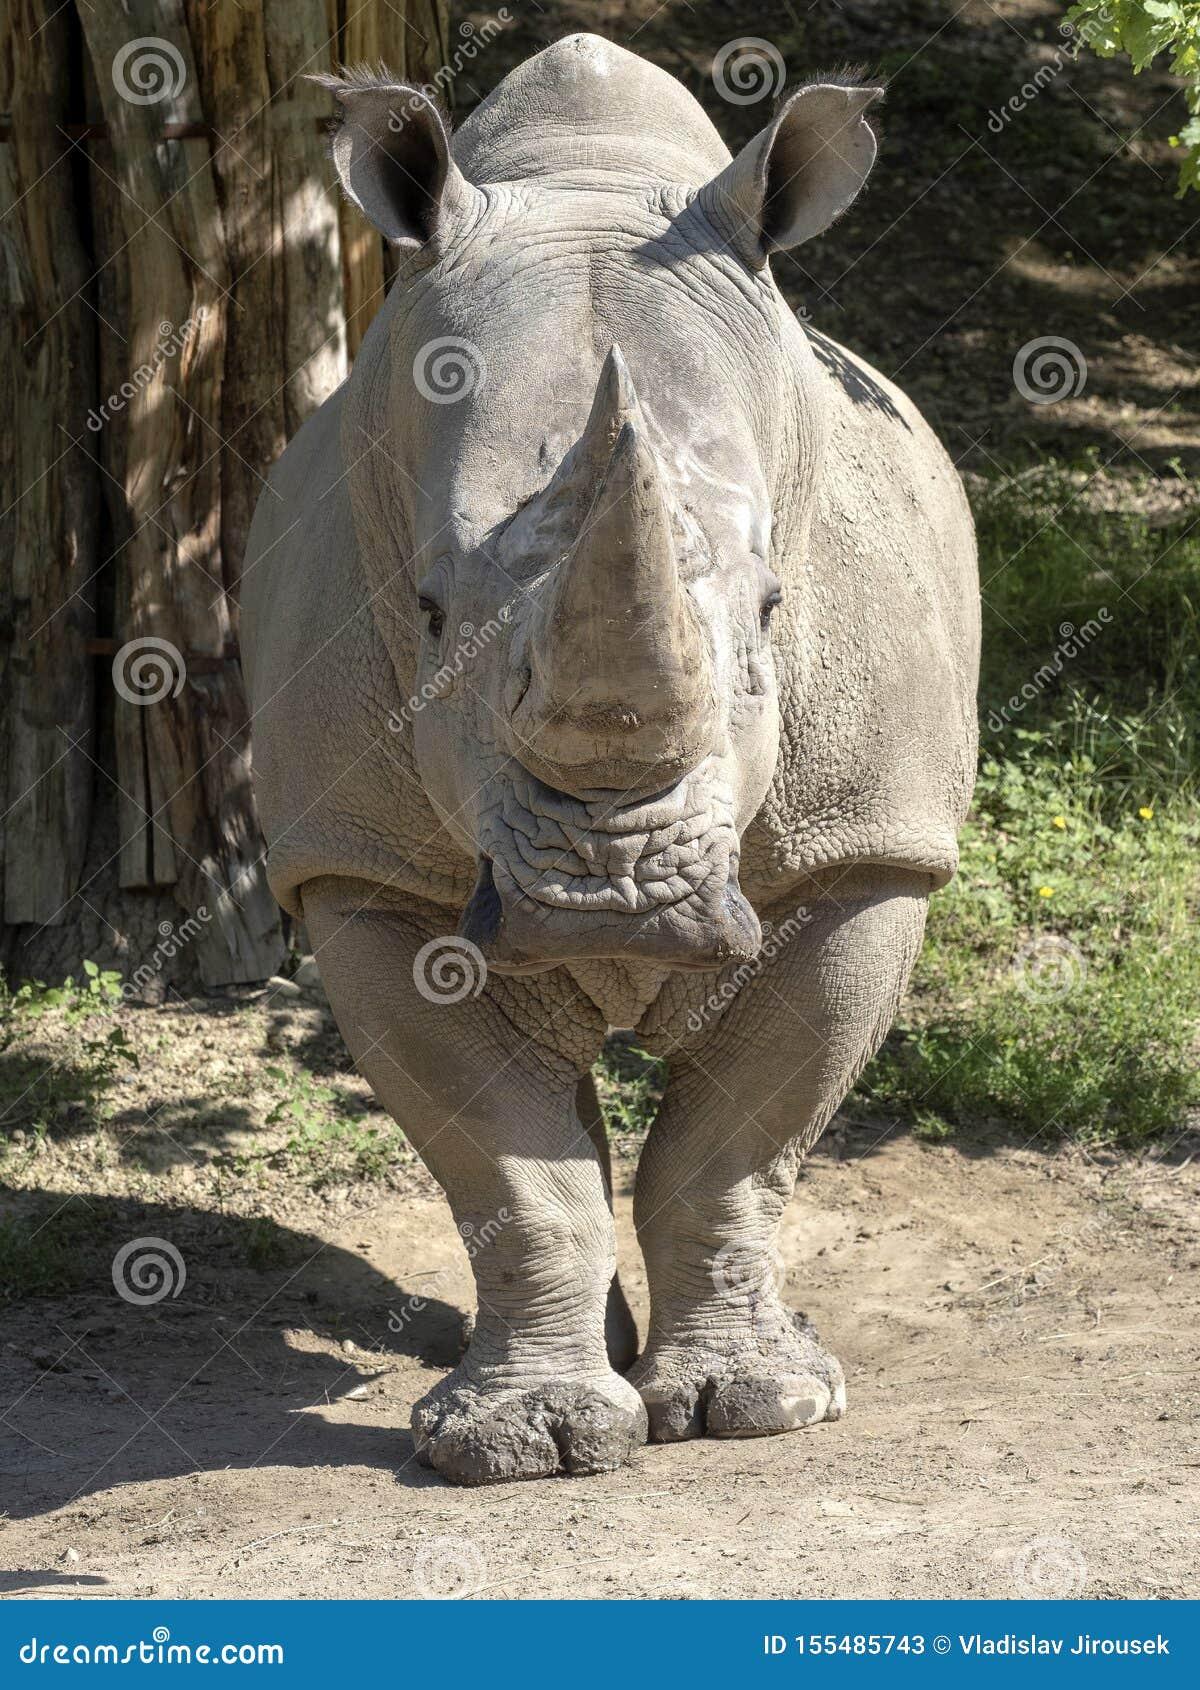 Southern White Rhinoceros, Ceratotherium simum simum, is threatened with extinction